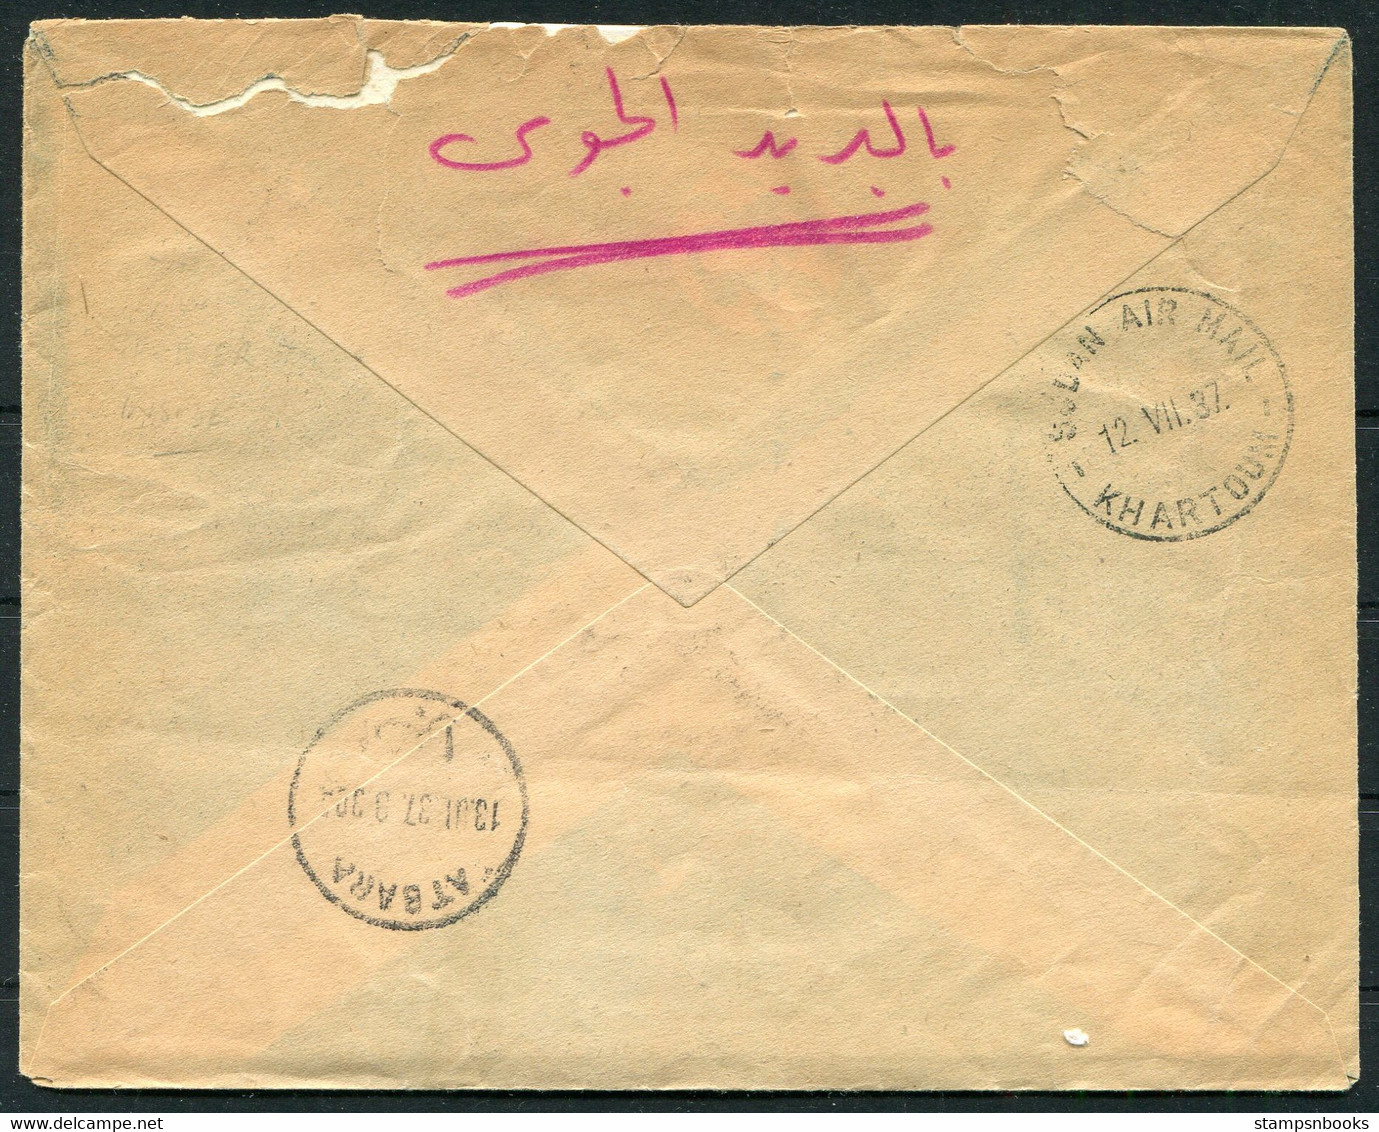 1937 Egypt Imperial Airways Airmail Cover Minya - Atbara Sudan Via Khartoum - Covers & Documents